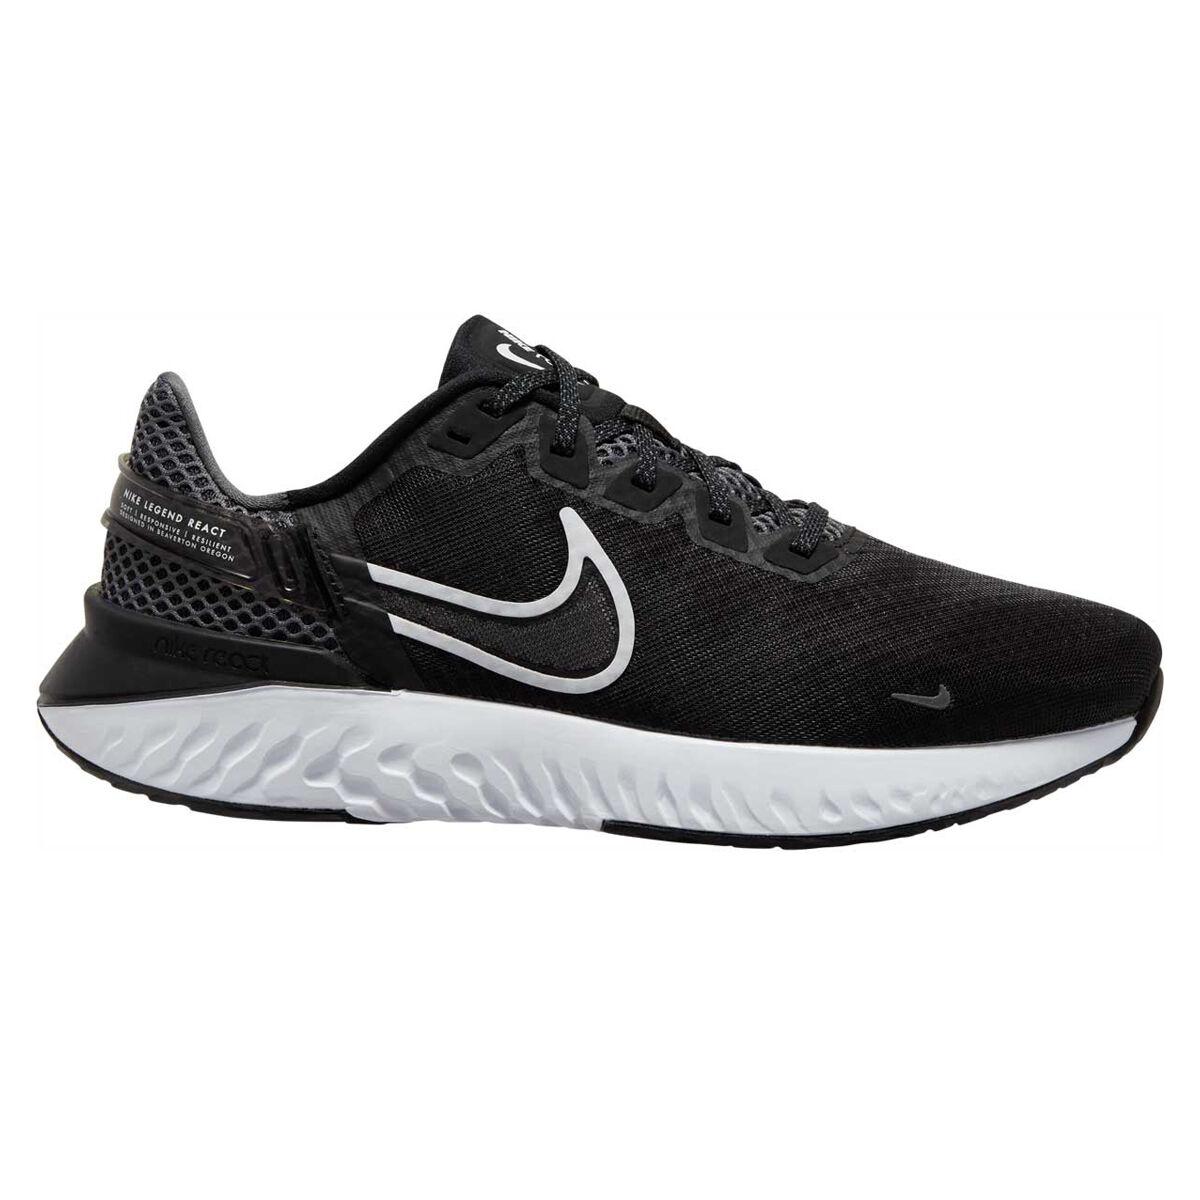 Nike Legend React 3 Mens Running Shoes